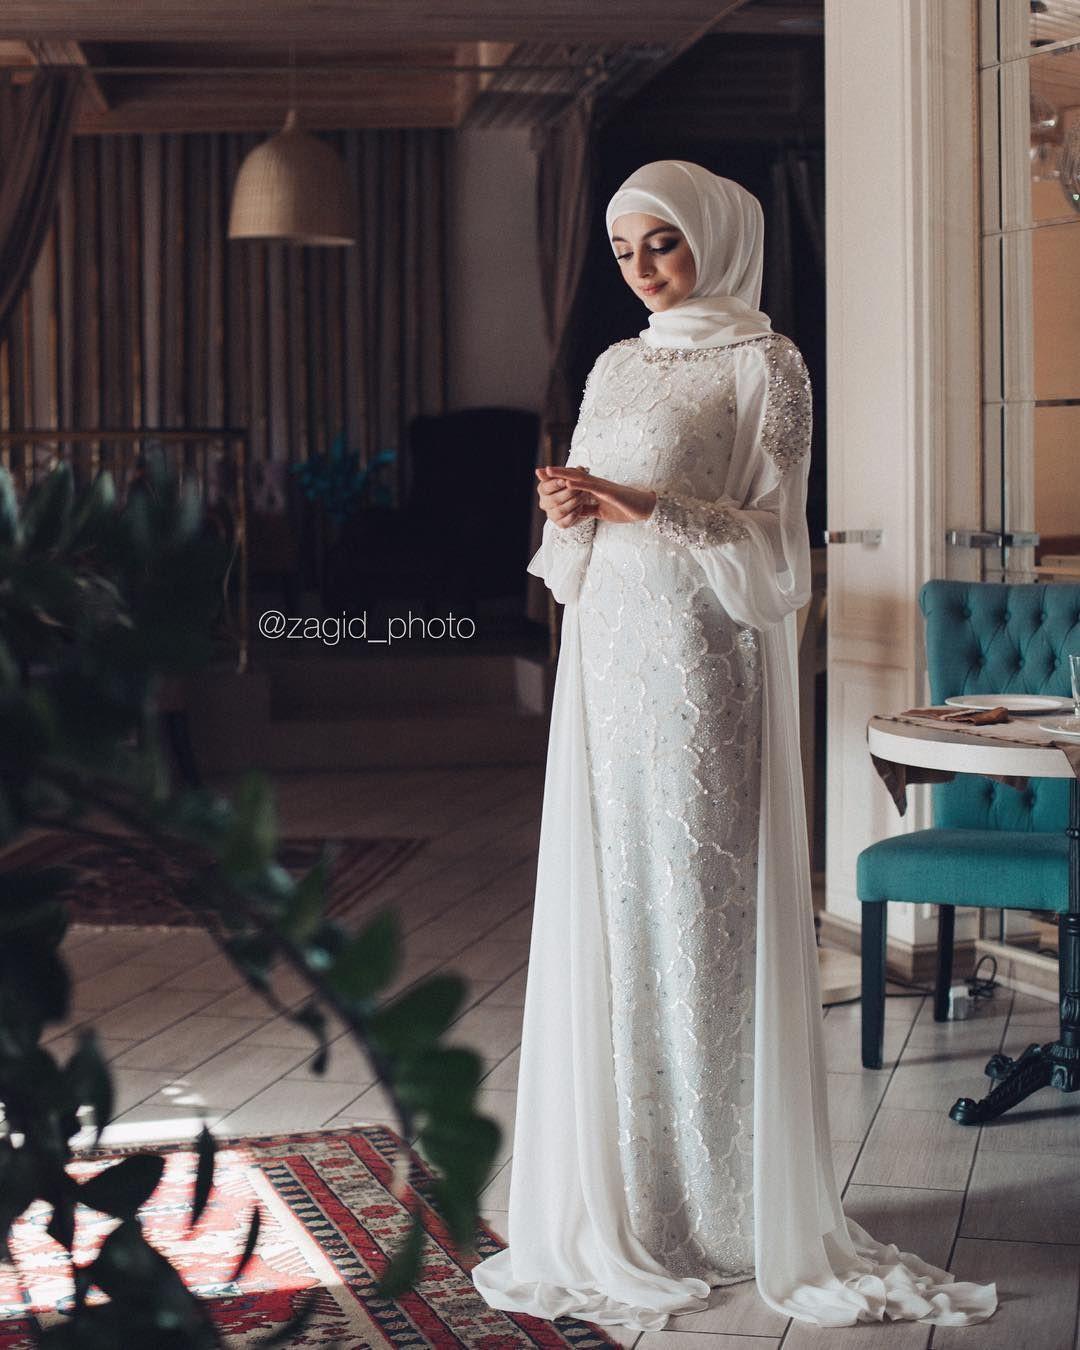 Gaun Pengantin Muslimah Simple Tapi Elegan Luxury Pin Oleh СевиРя Бекирова Di Хиджабы Di 2019